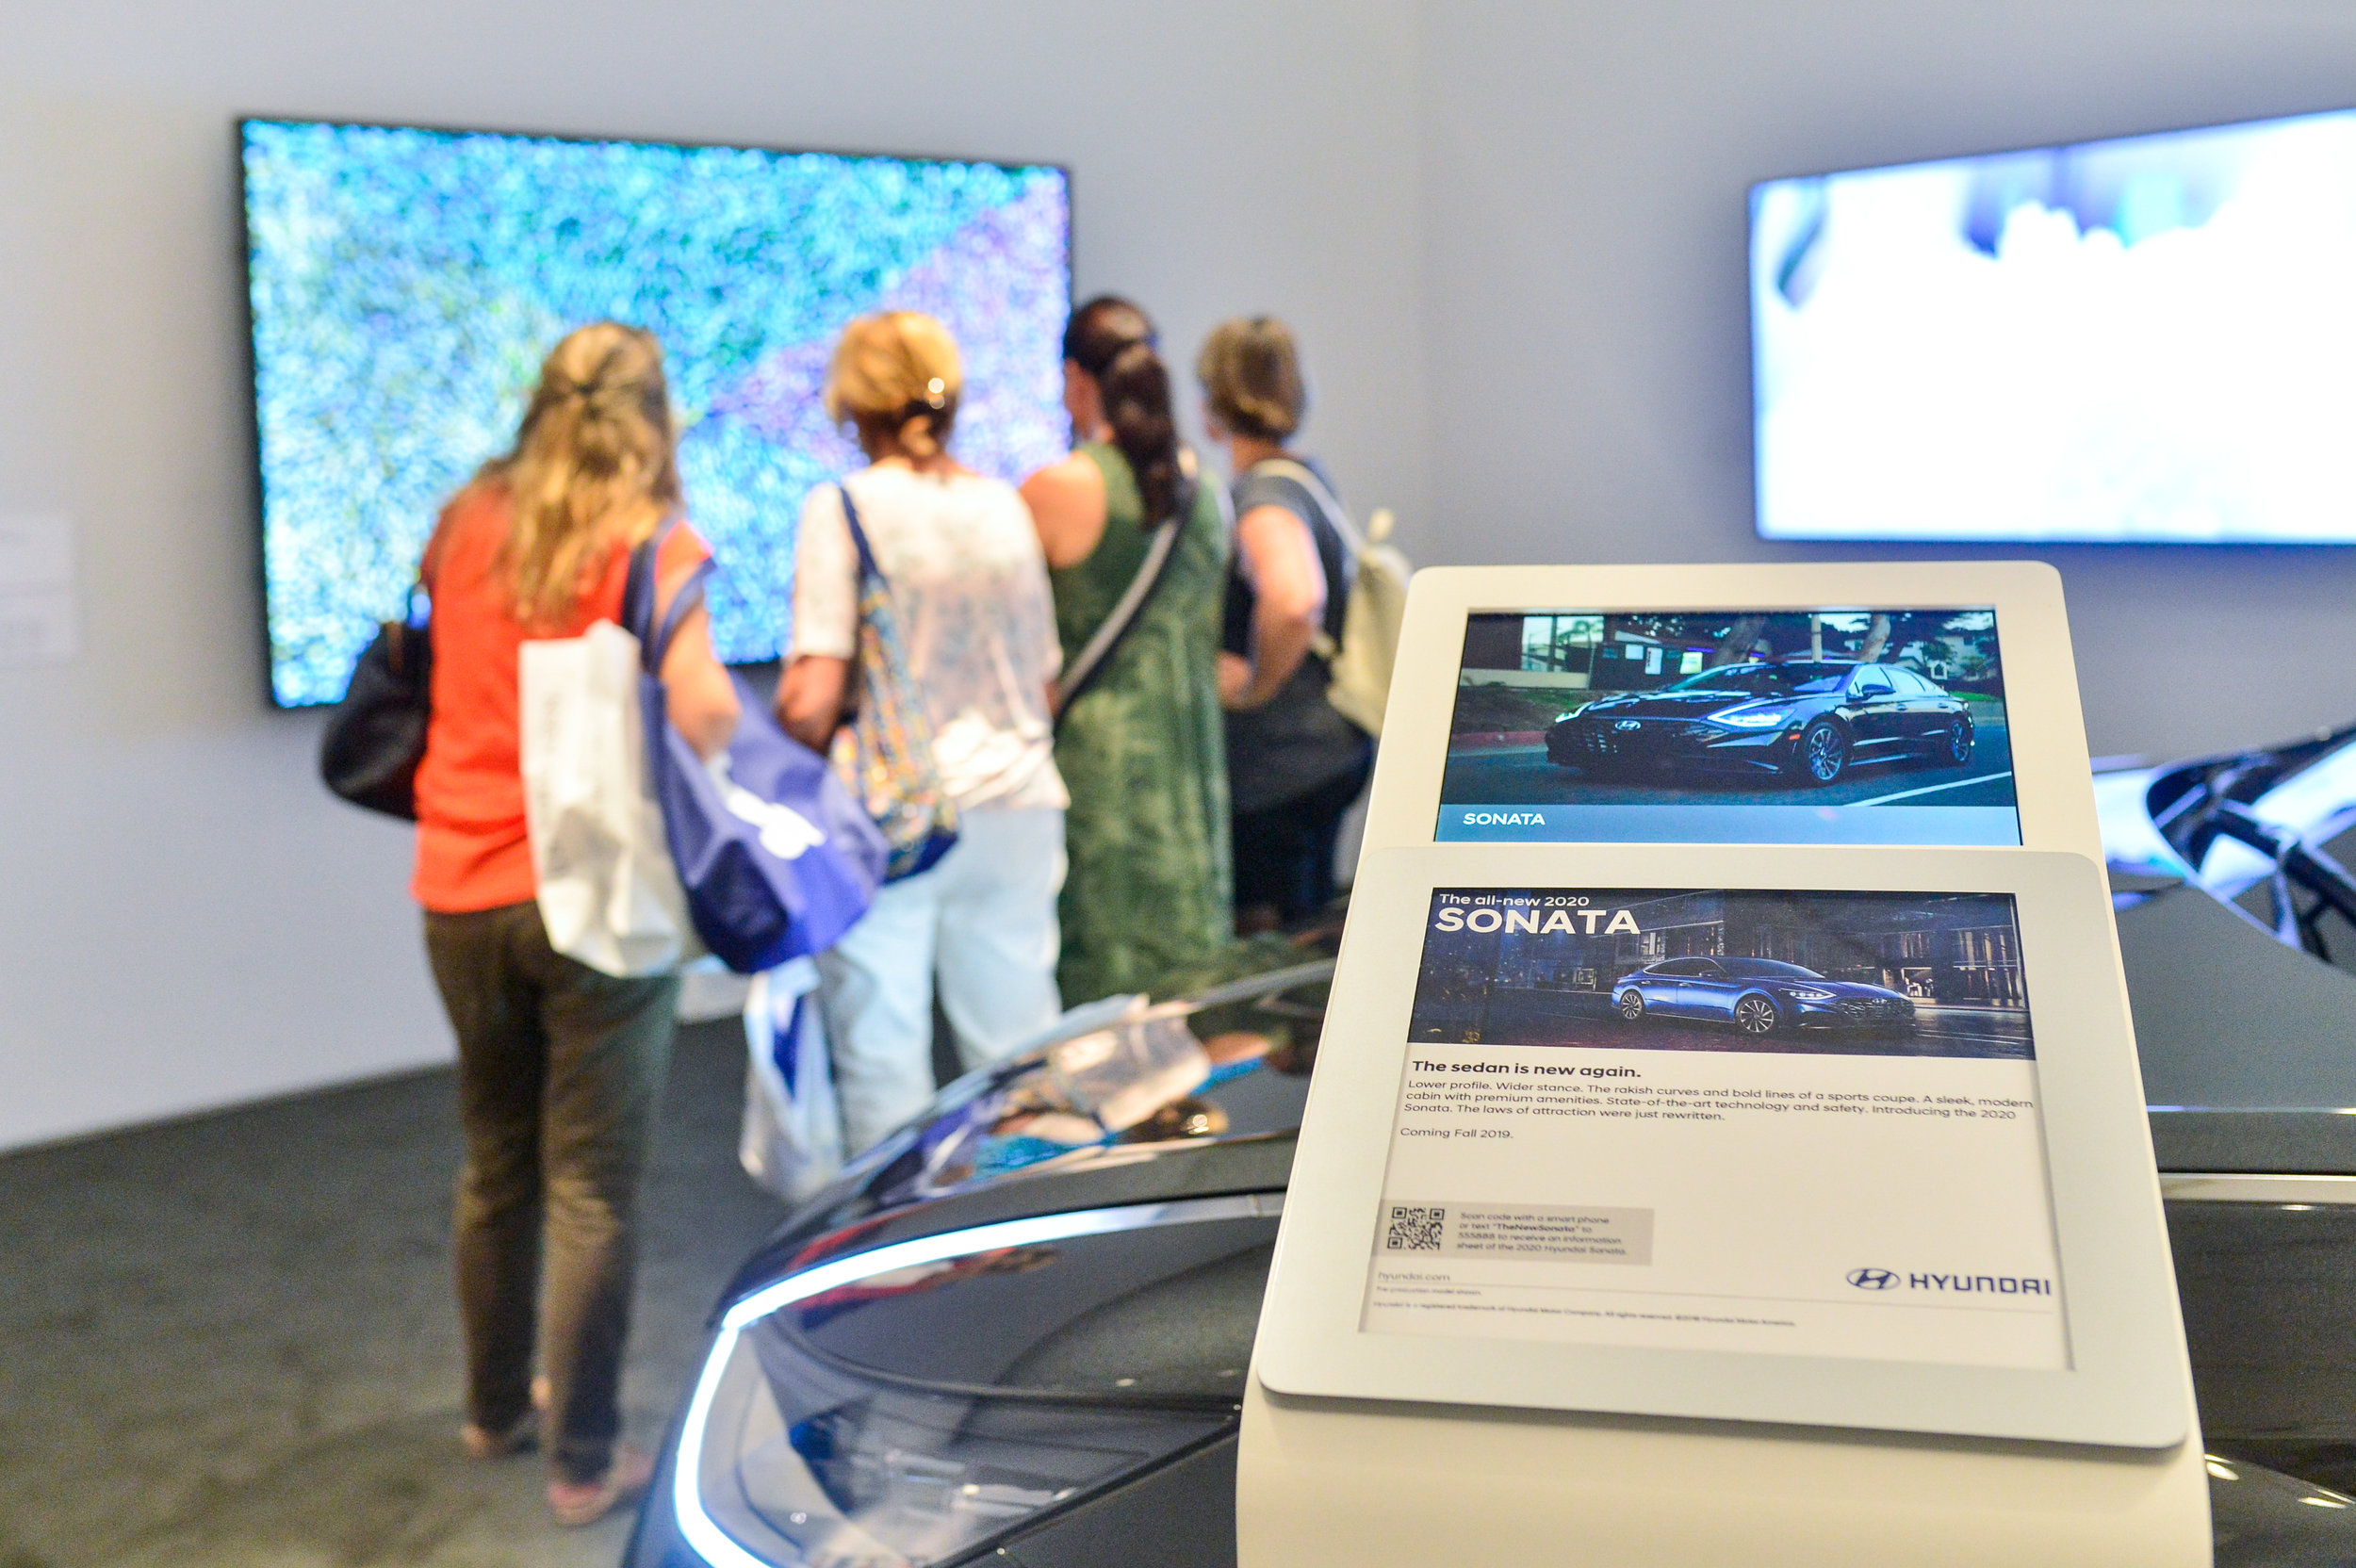 OHelloMedia-Hyundai-Christie'sAuctionHouse-6.26-TopSelect-5778.jpg